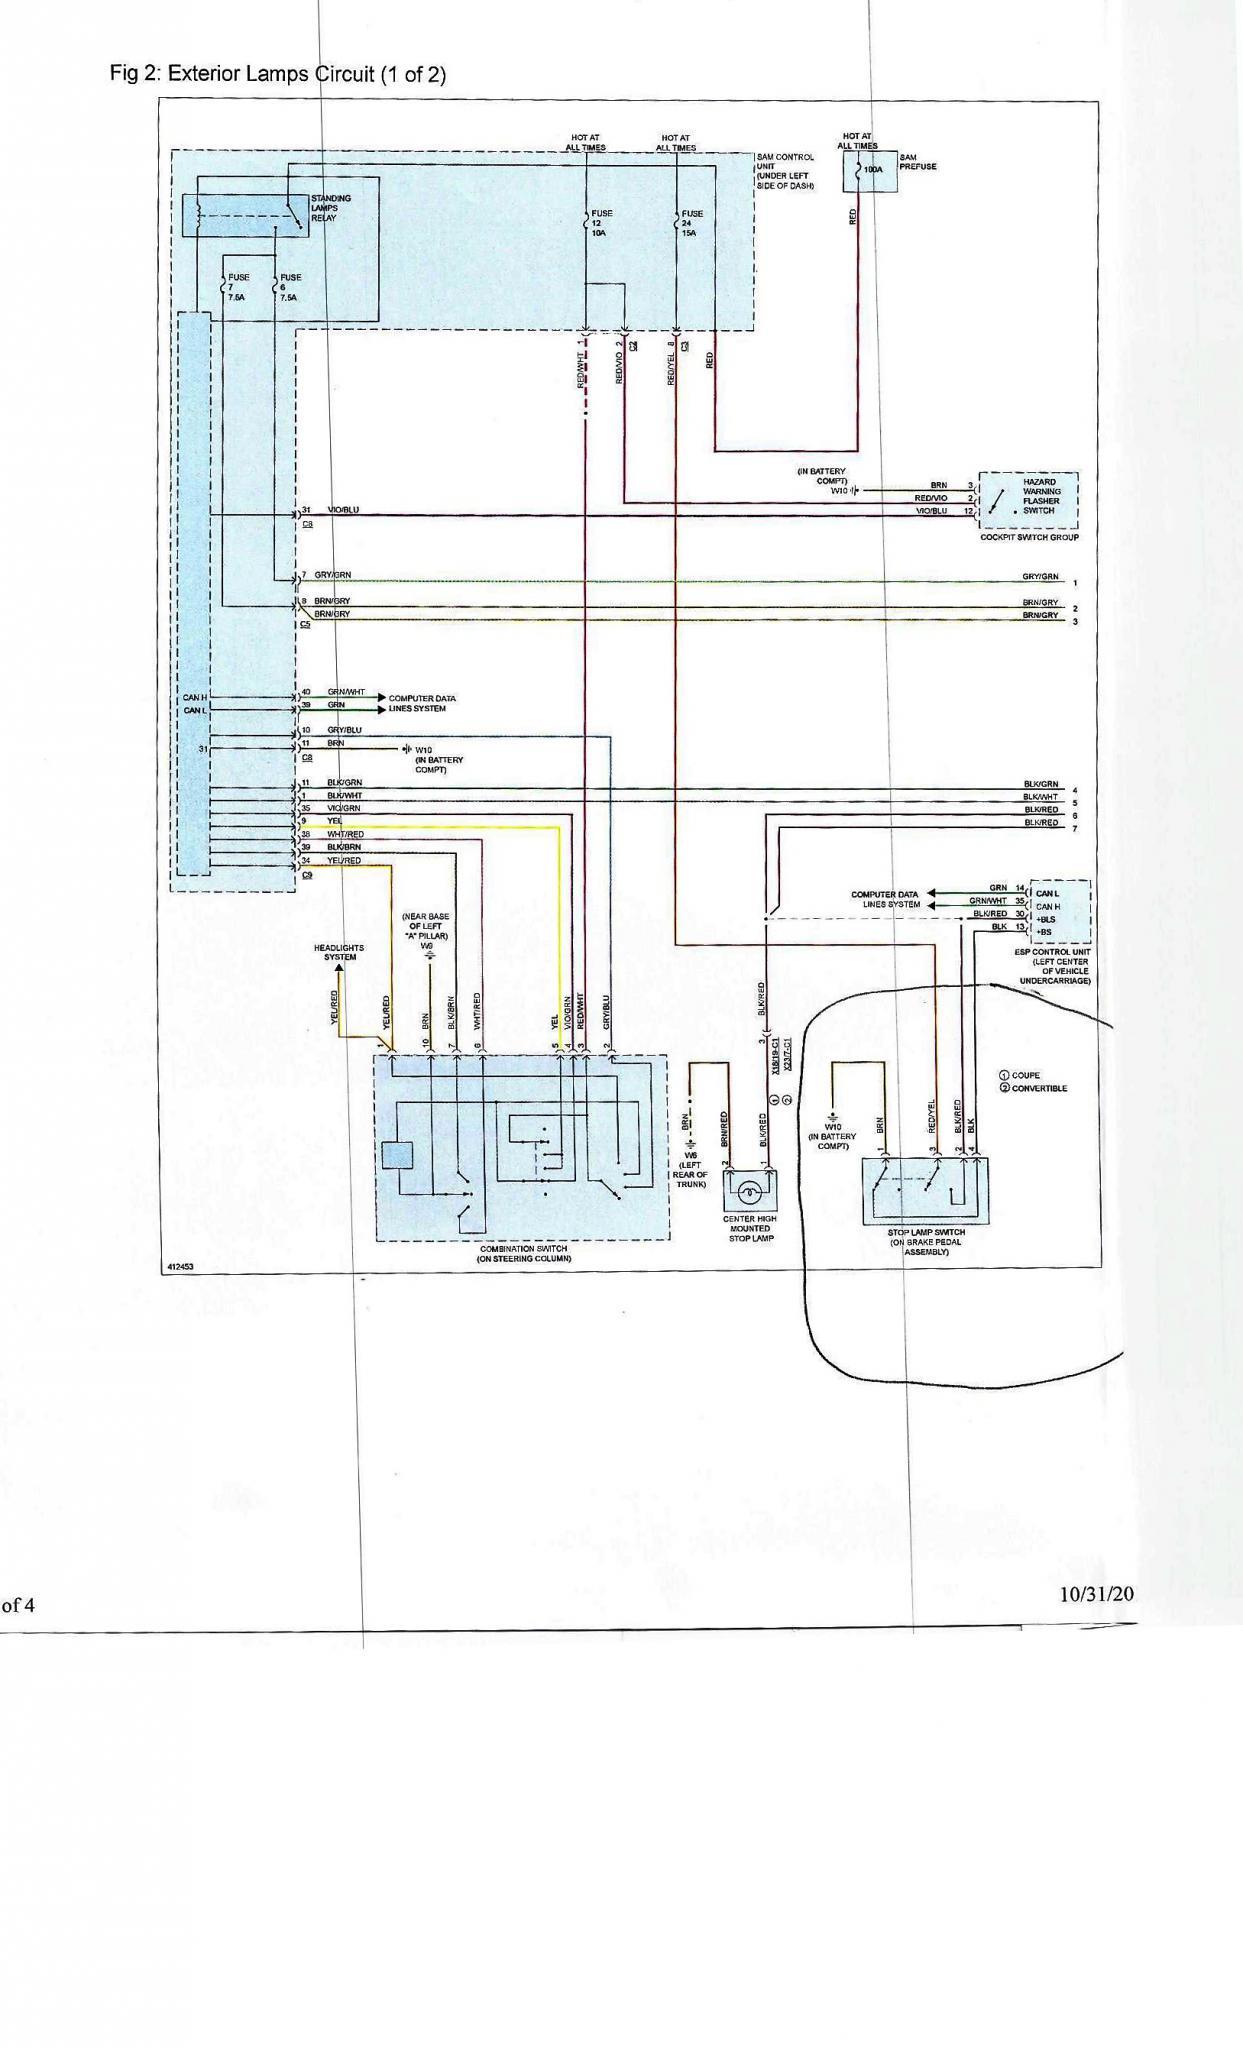 DIAGRAM] Wiring Diagram 9s12 Smart Car FULL Version HD Quality Smart Car -  1110VWIRING1.ARBREDESVOIX.FRarbredesvoix.fr